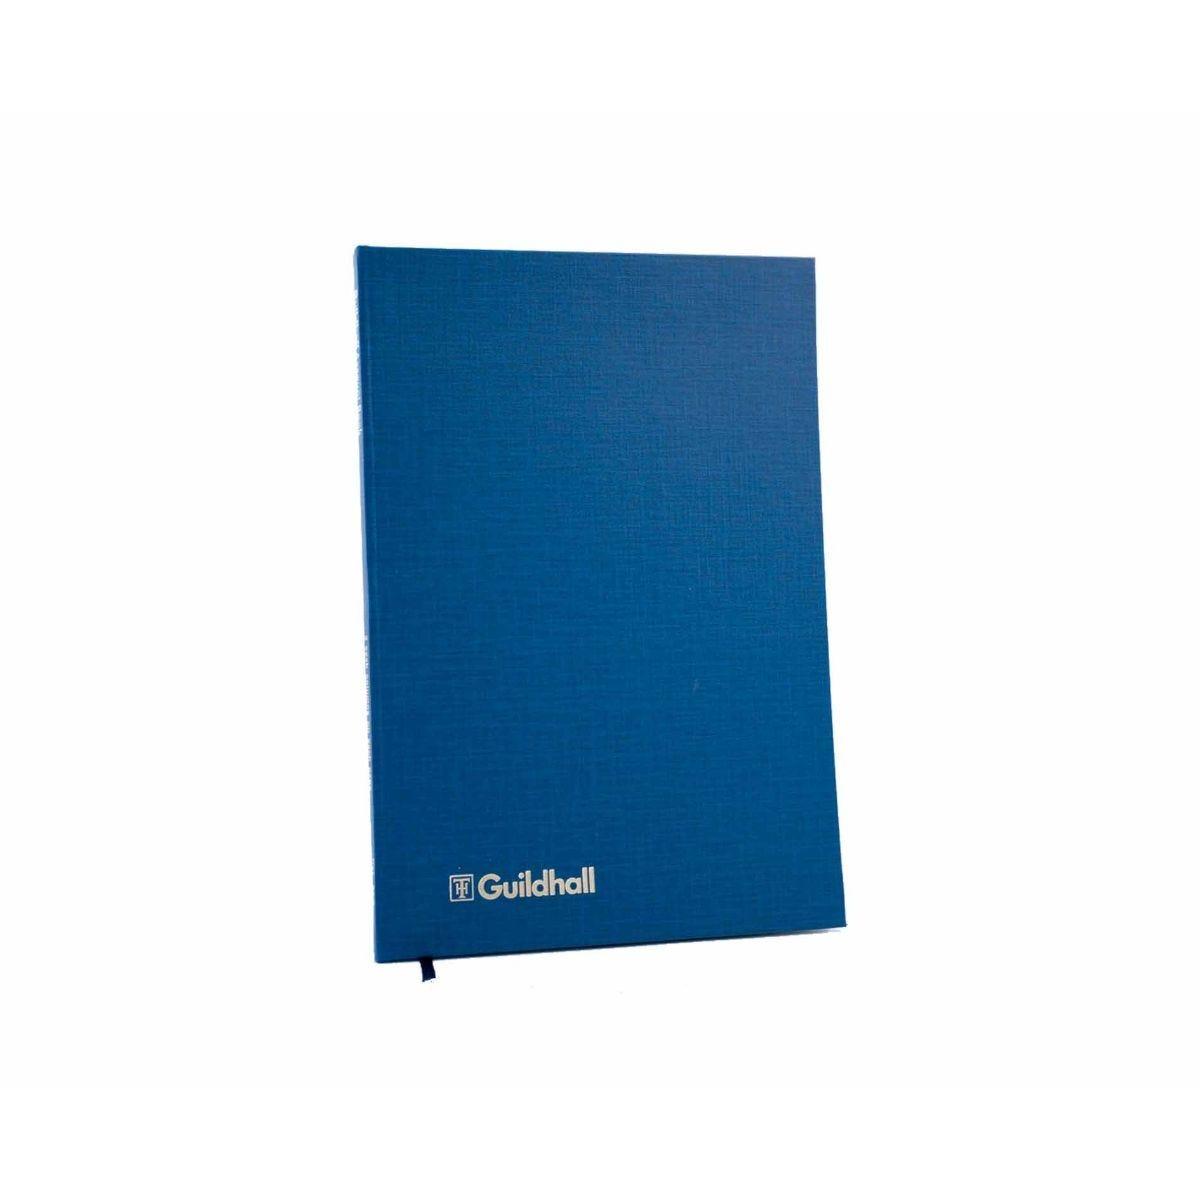 Guildhall Account Book 31 Series 12 Column A4